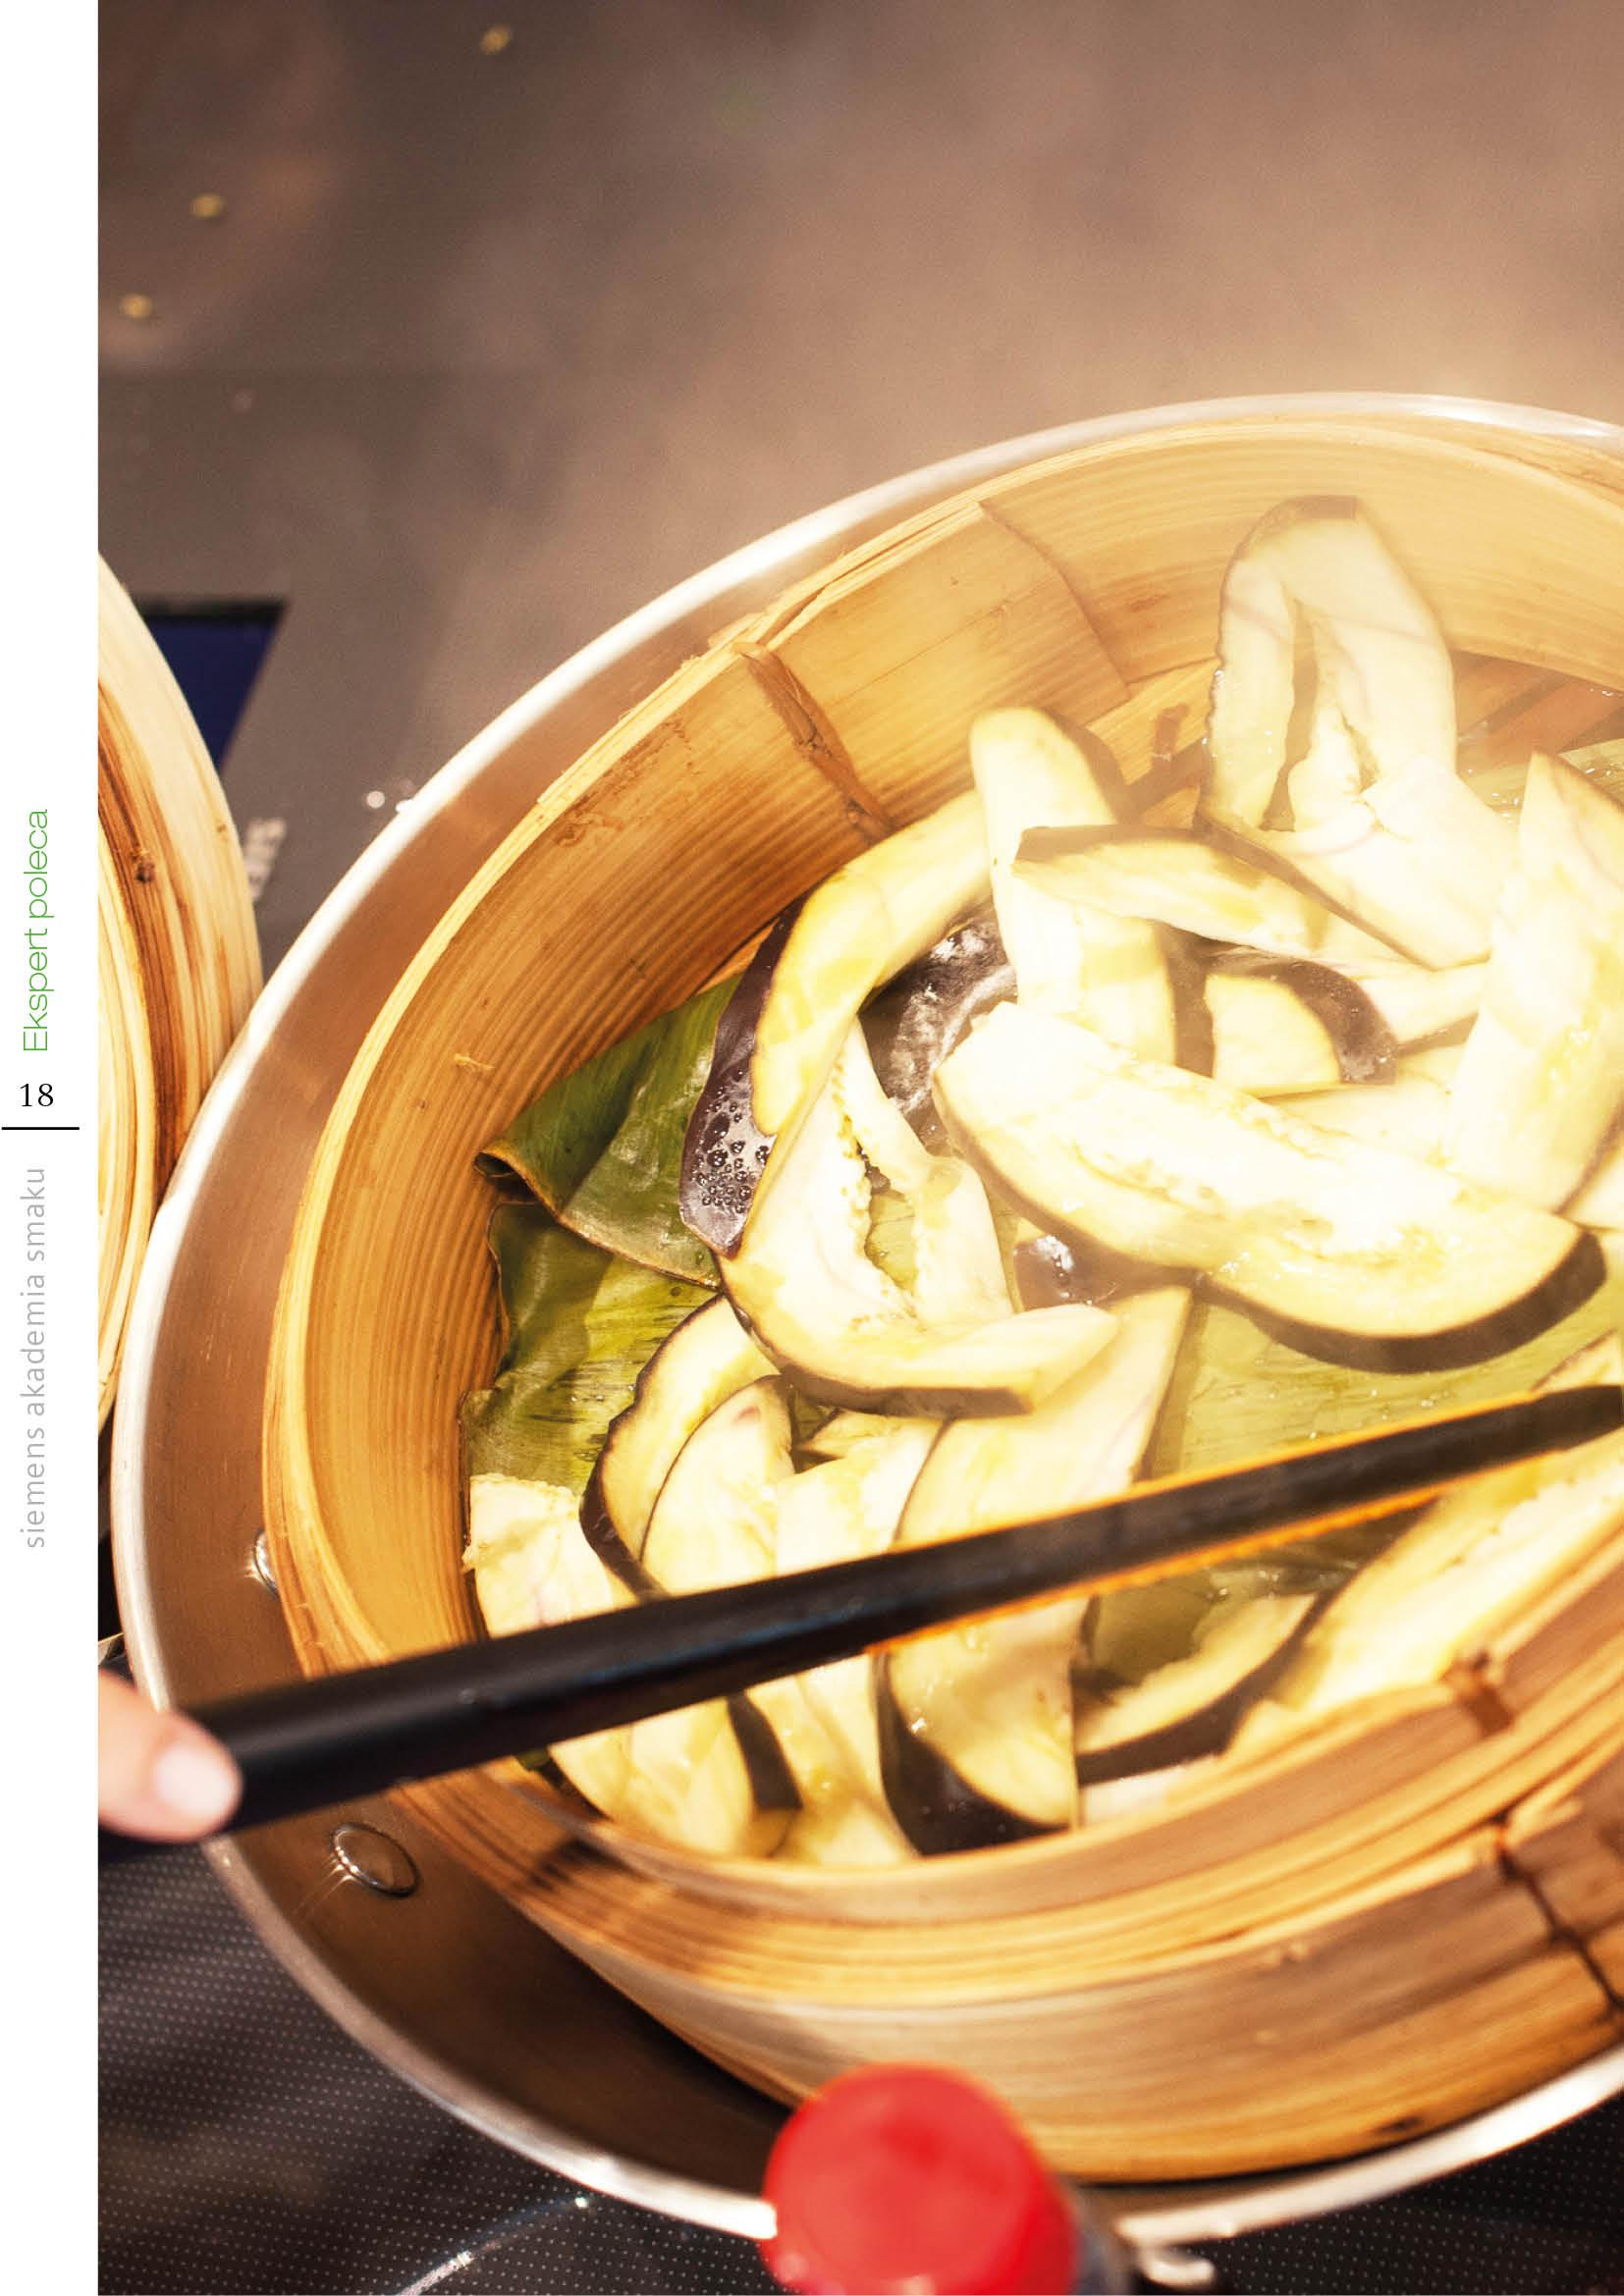 Kuchnia chińska - Strona 18